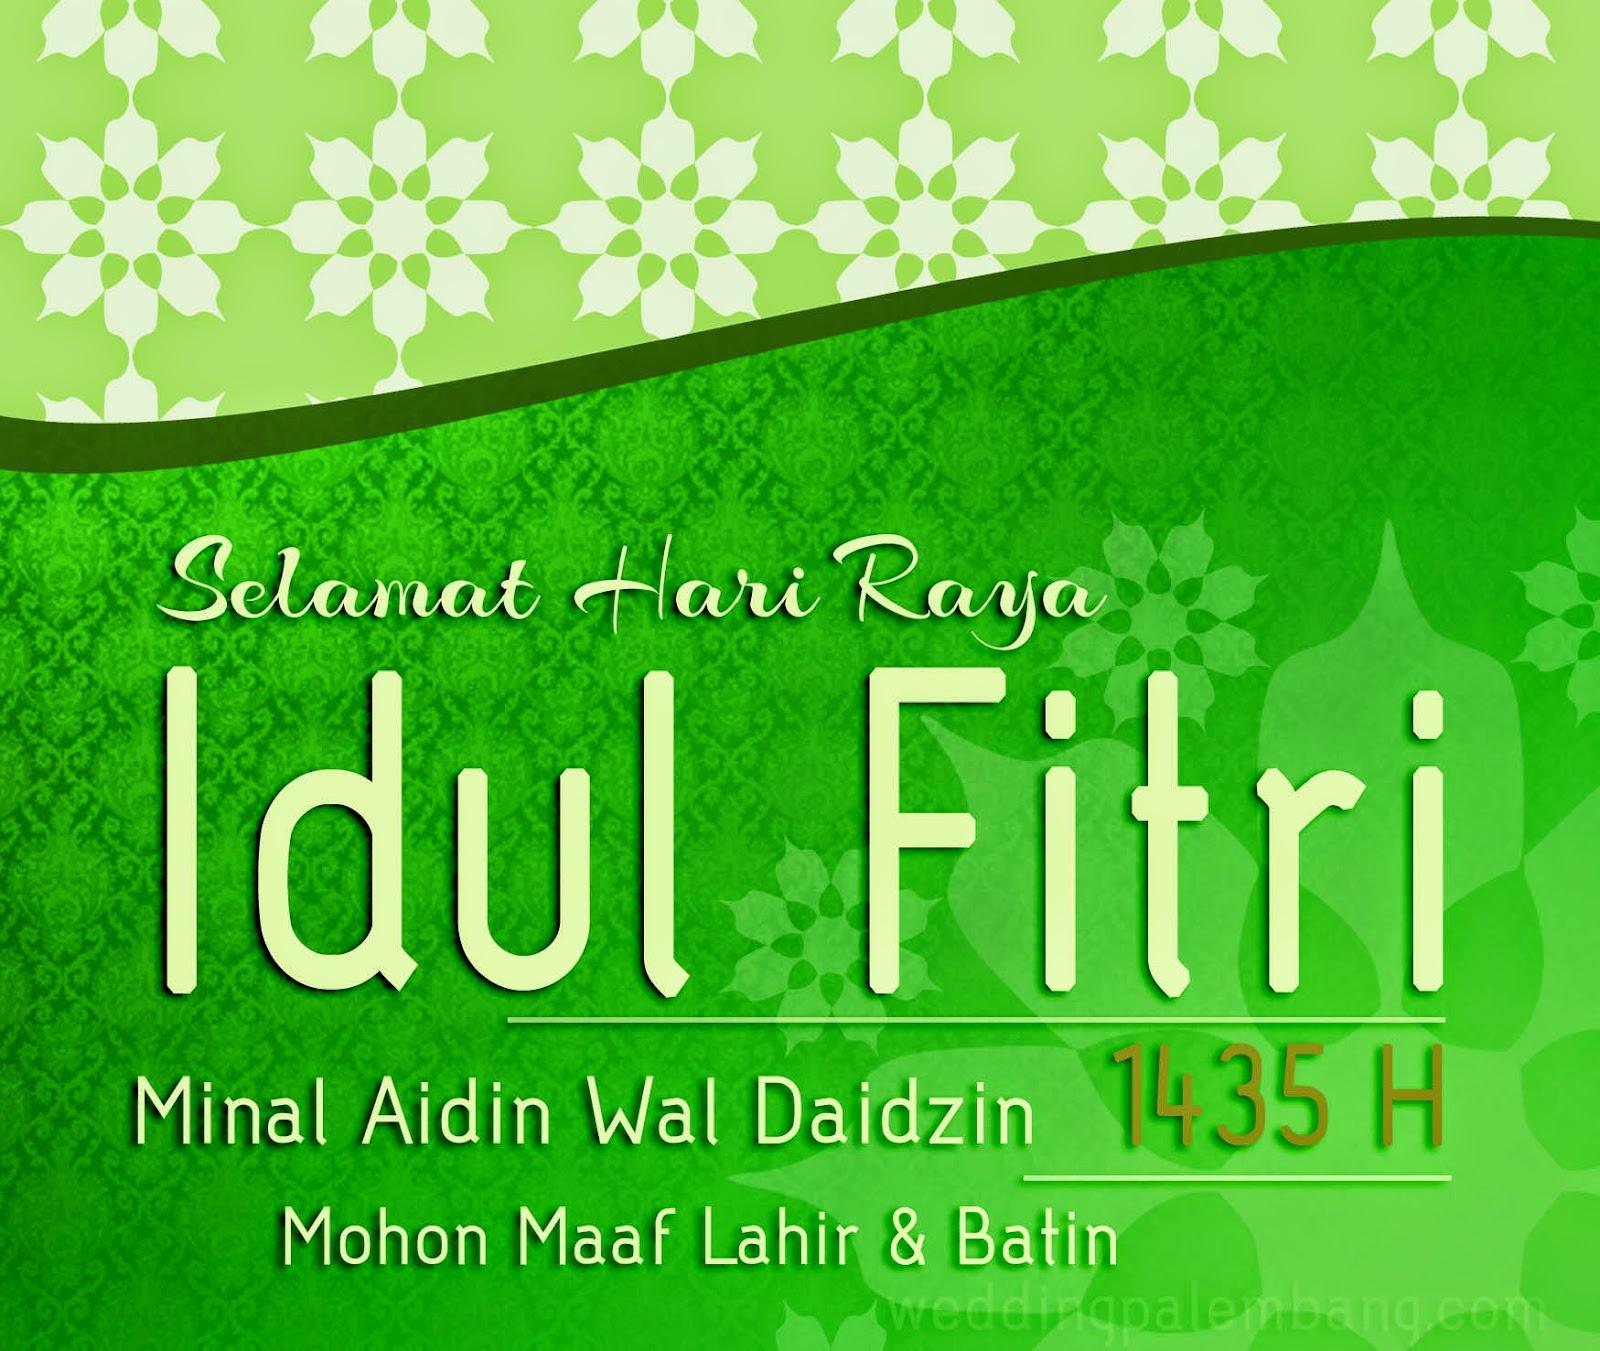 Selamat Hari Raya Idul Fitri: Koleksi Download Gambar Lucu Hari Raya Idul Fitri